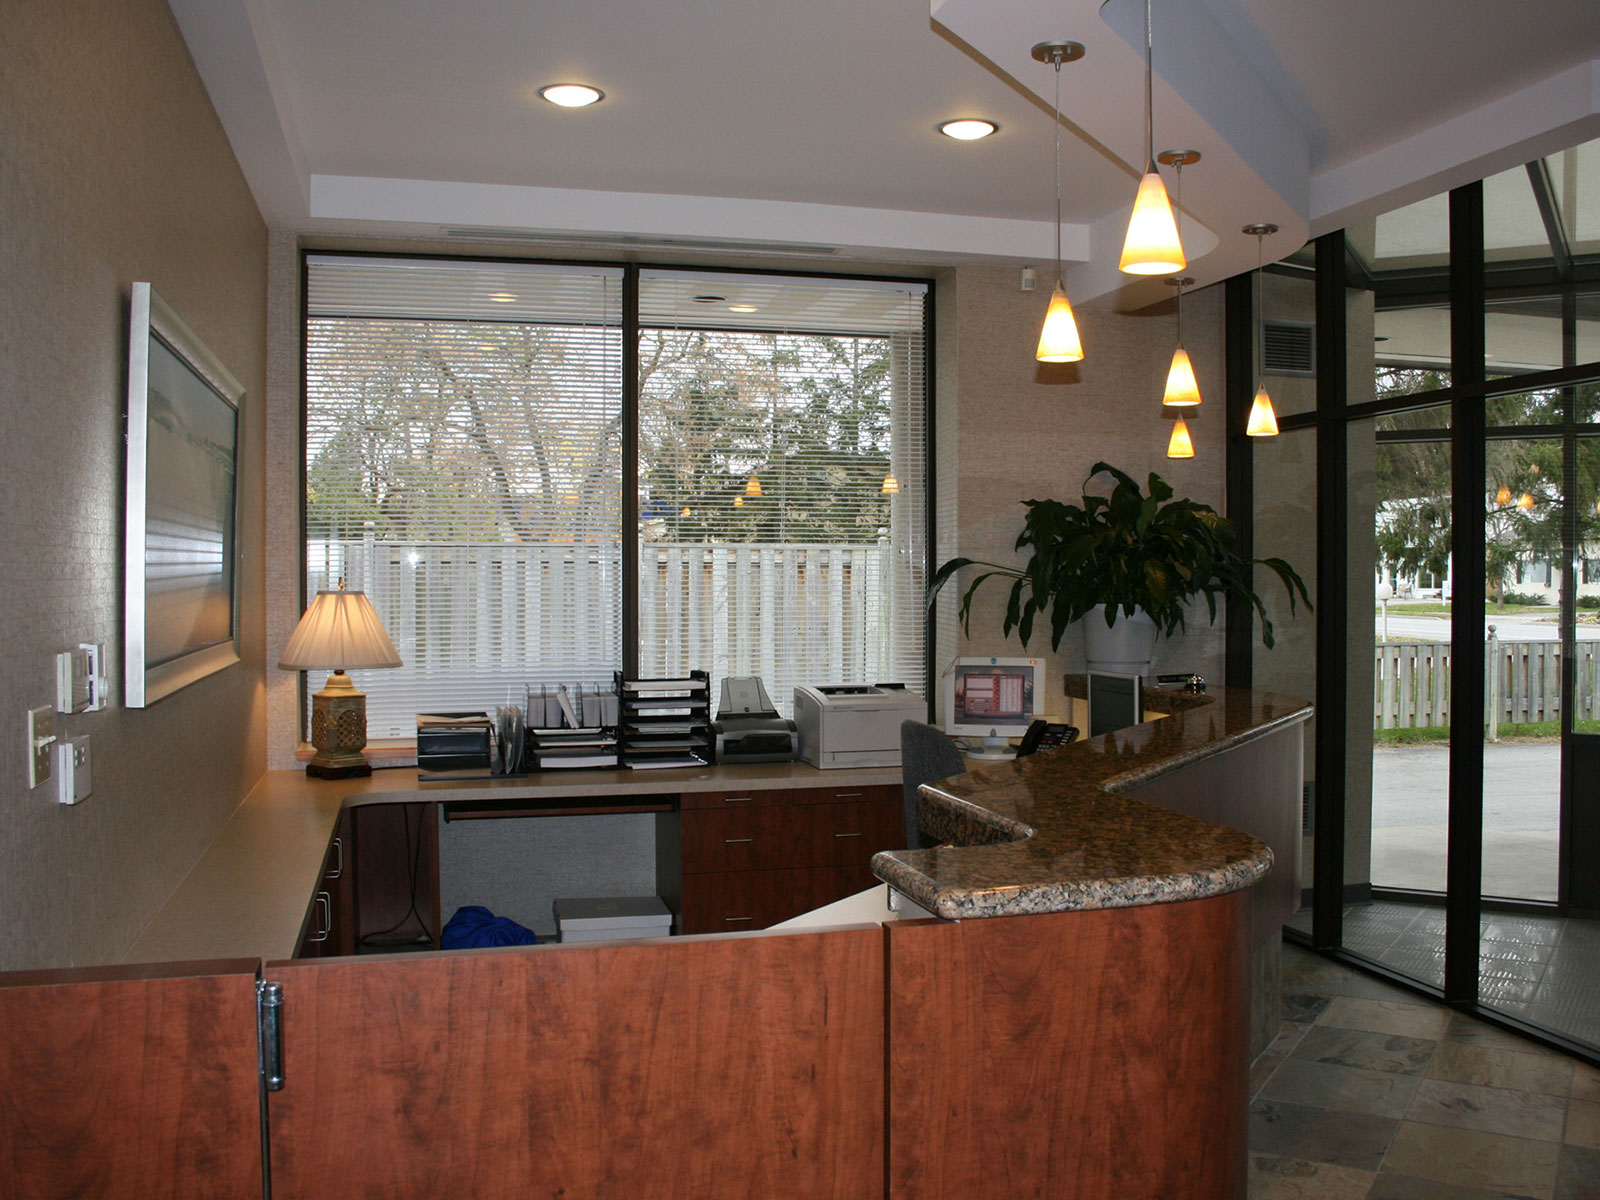 Reception Area Millwork - Pendant Lighting